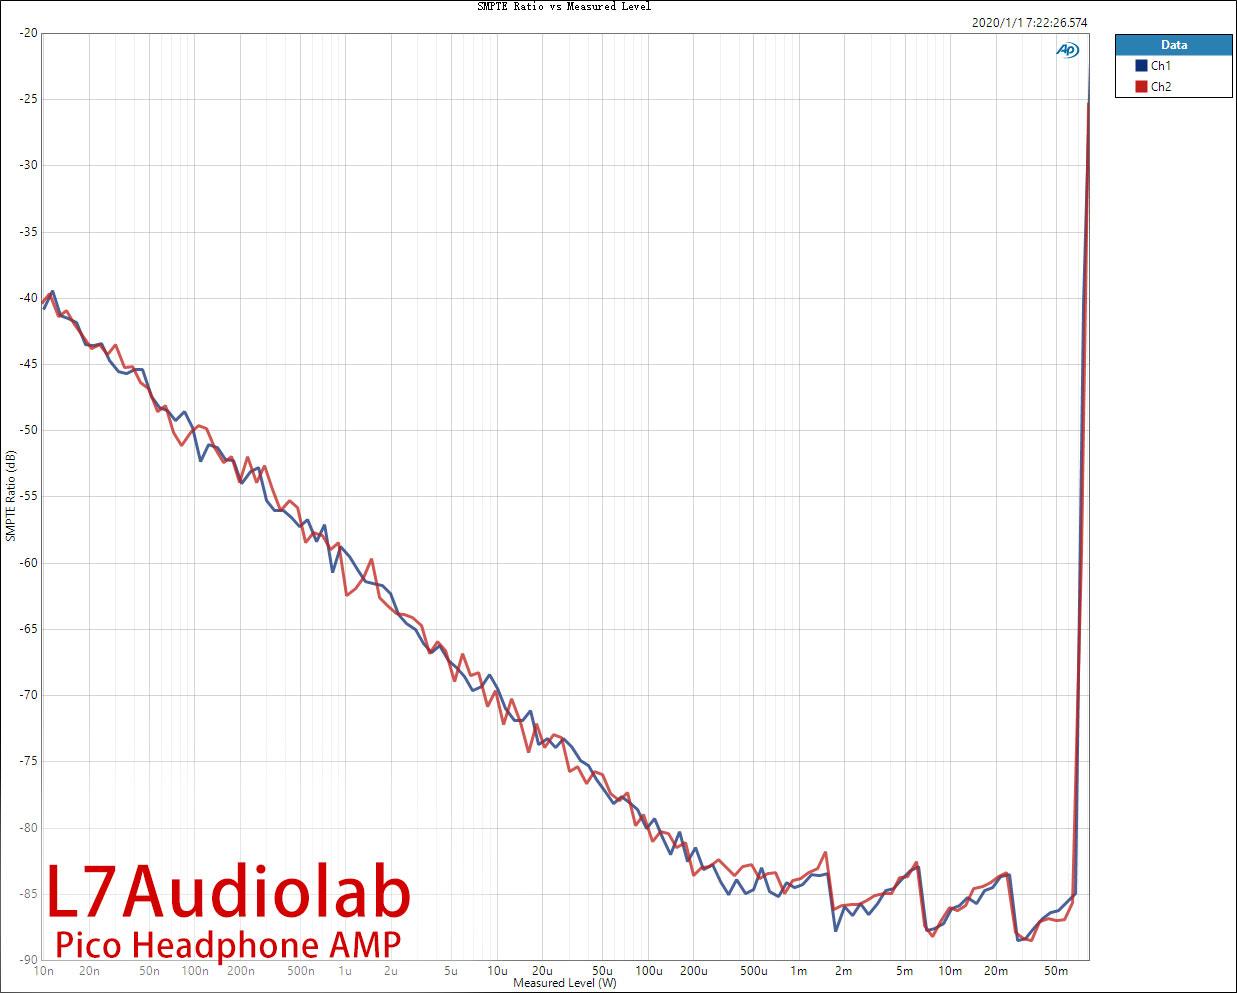 SMPTE-Ratio-vs-Measured-Level.jpg